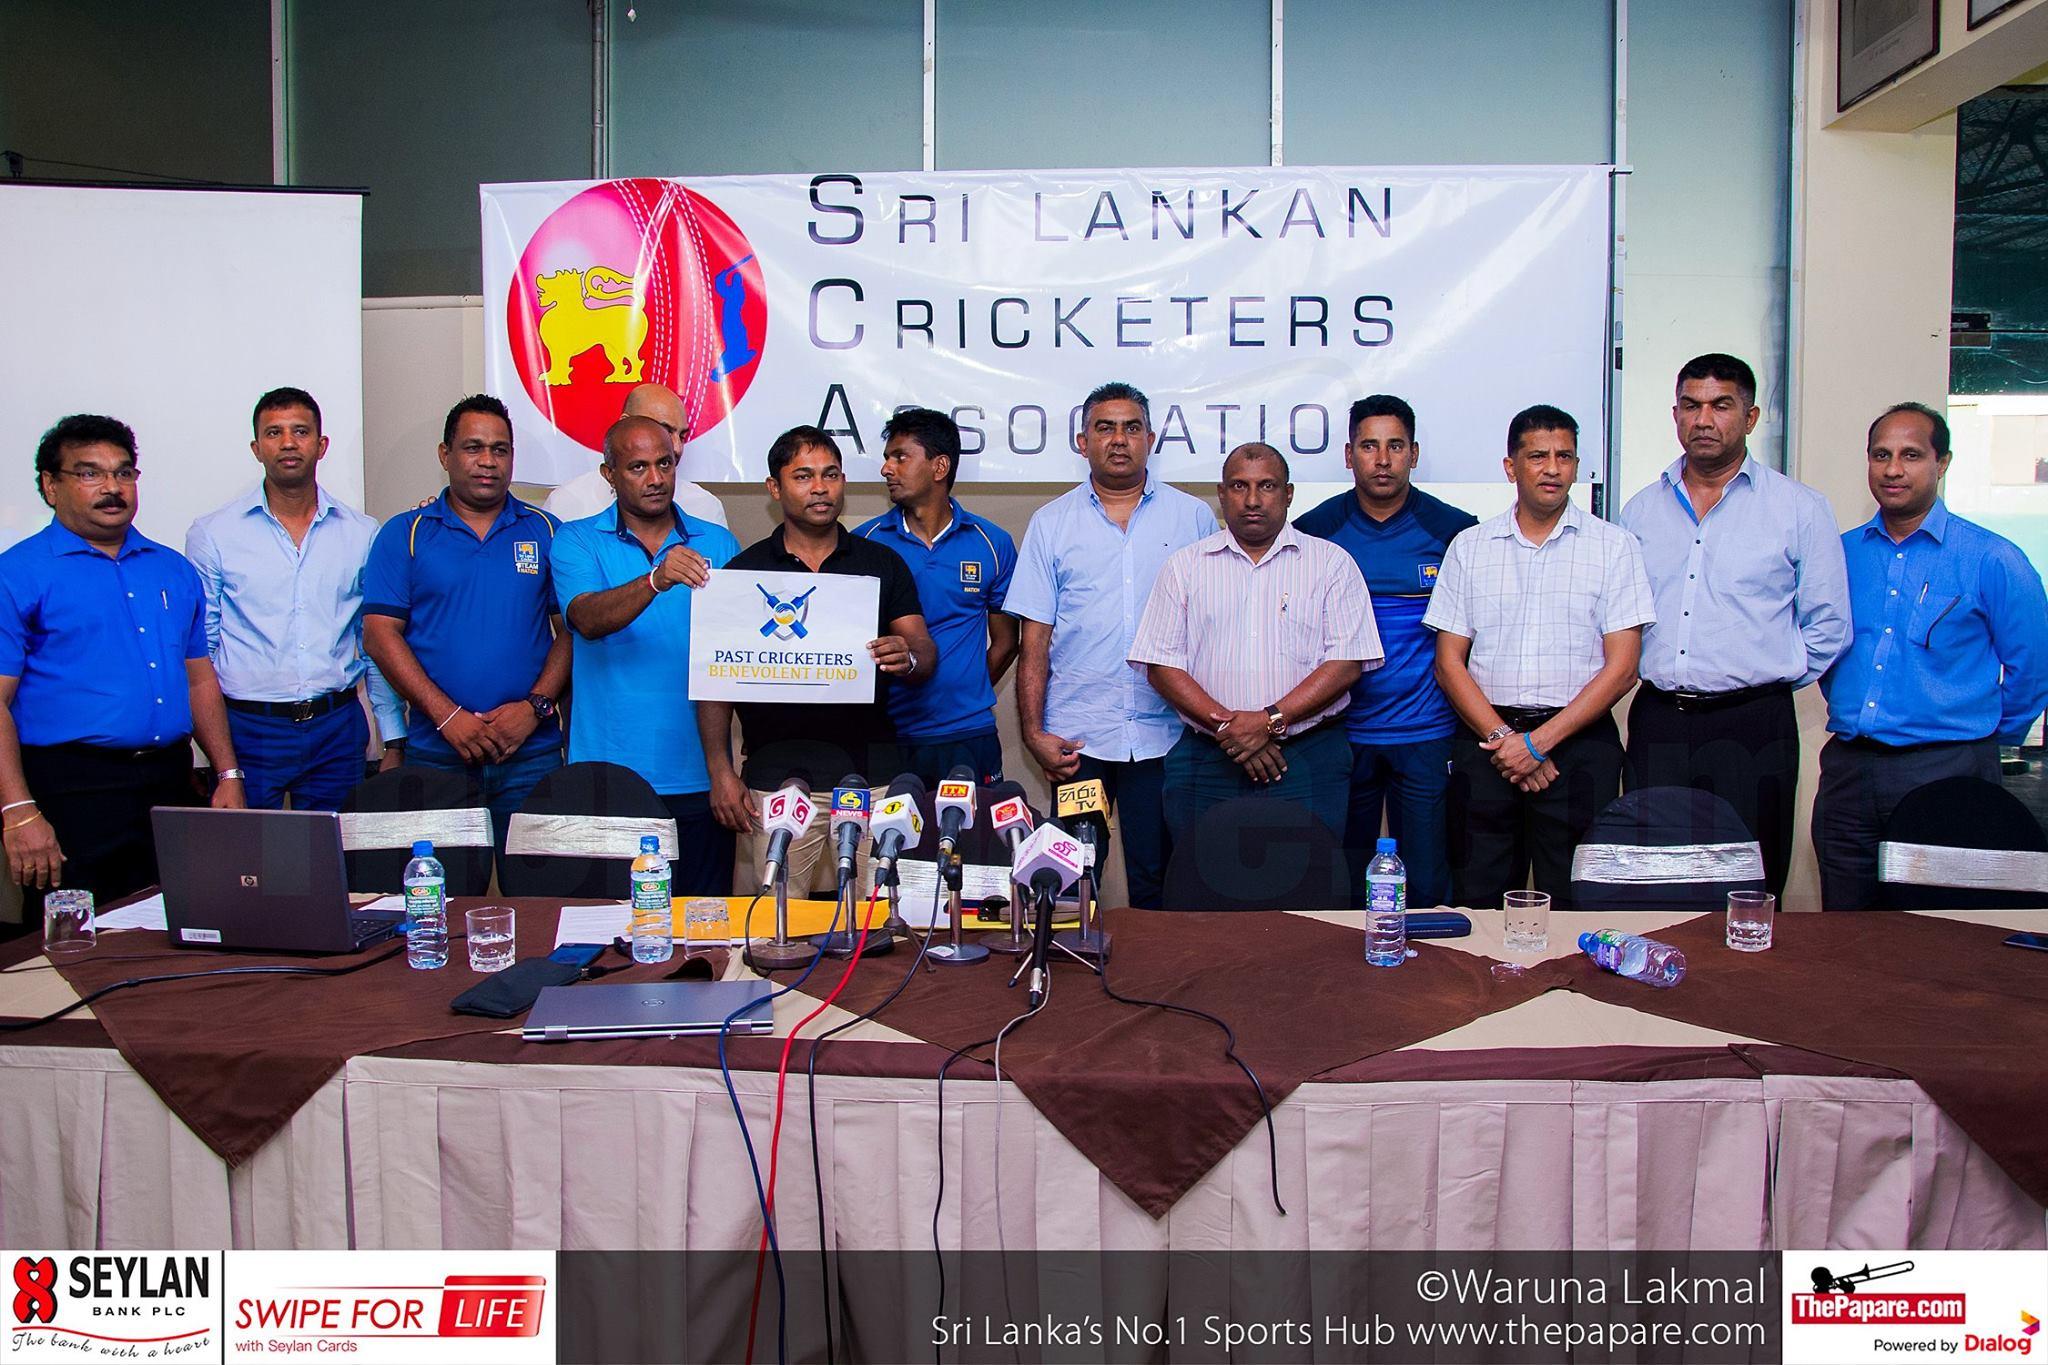 Sri Lankan Cricketers Association launches Benevolent Fund